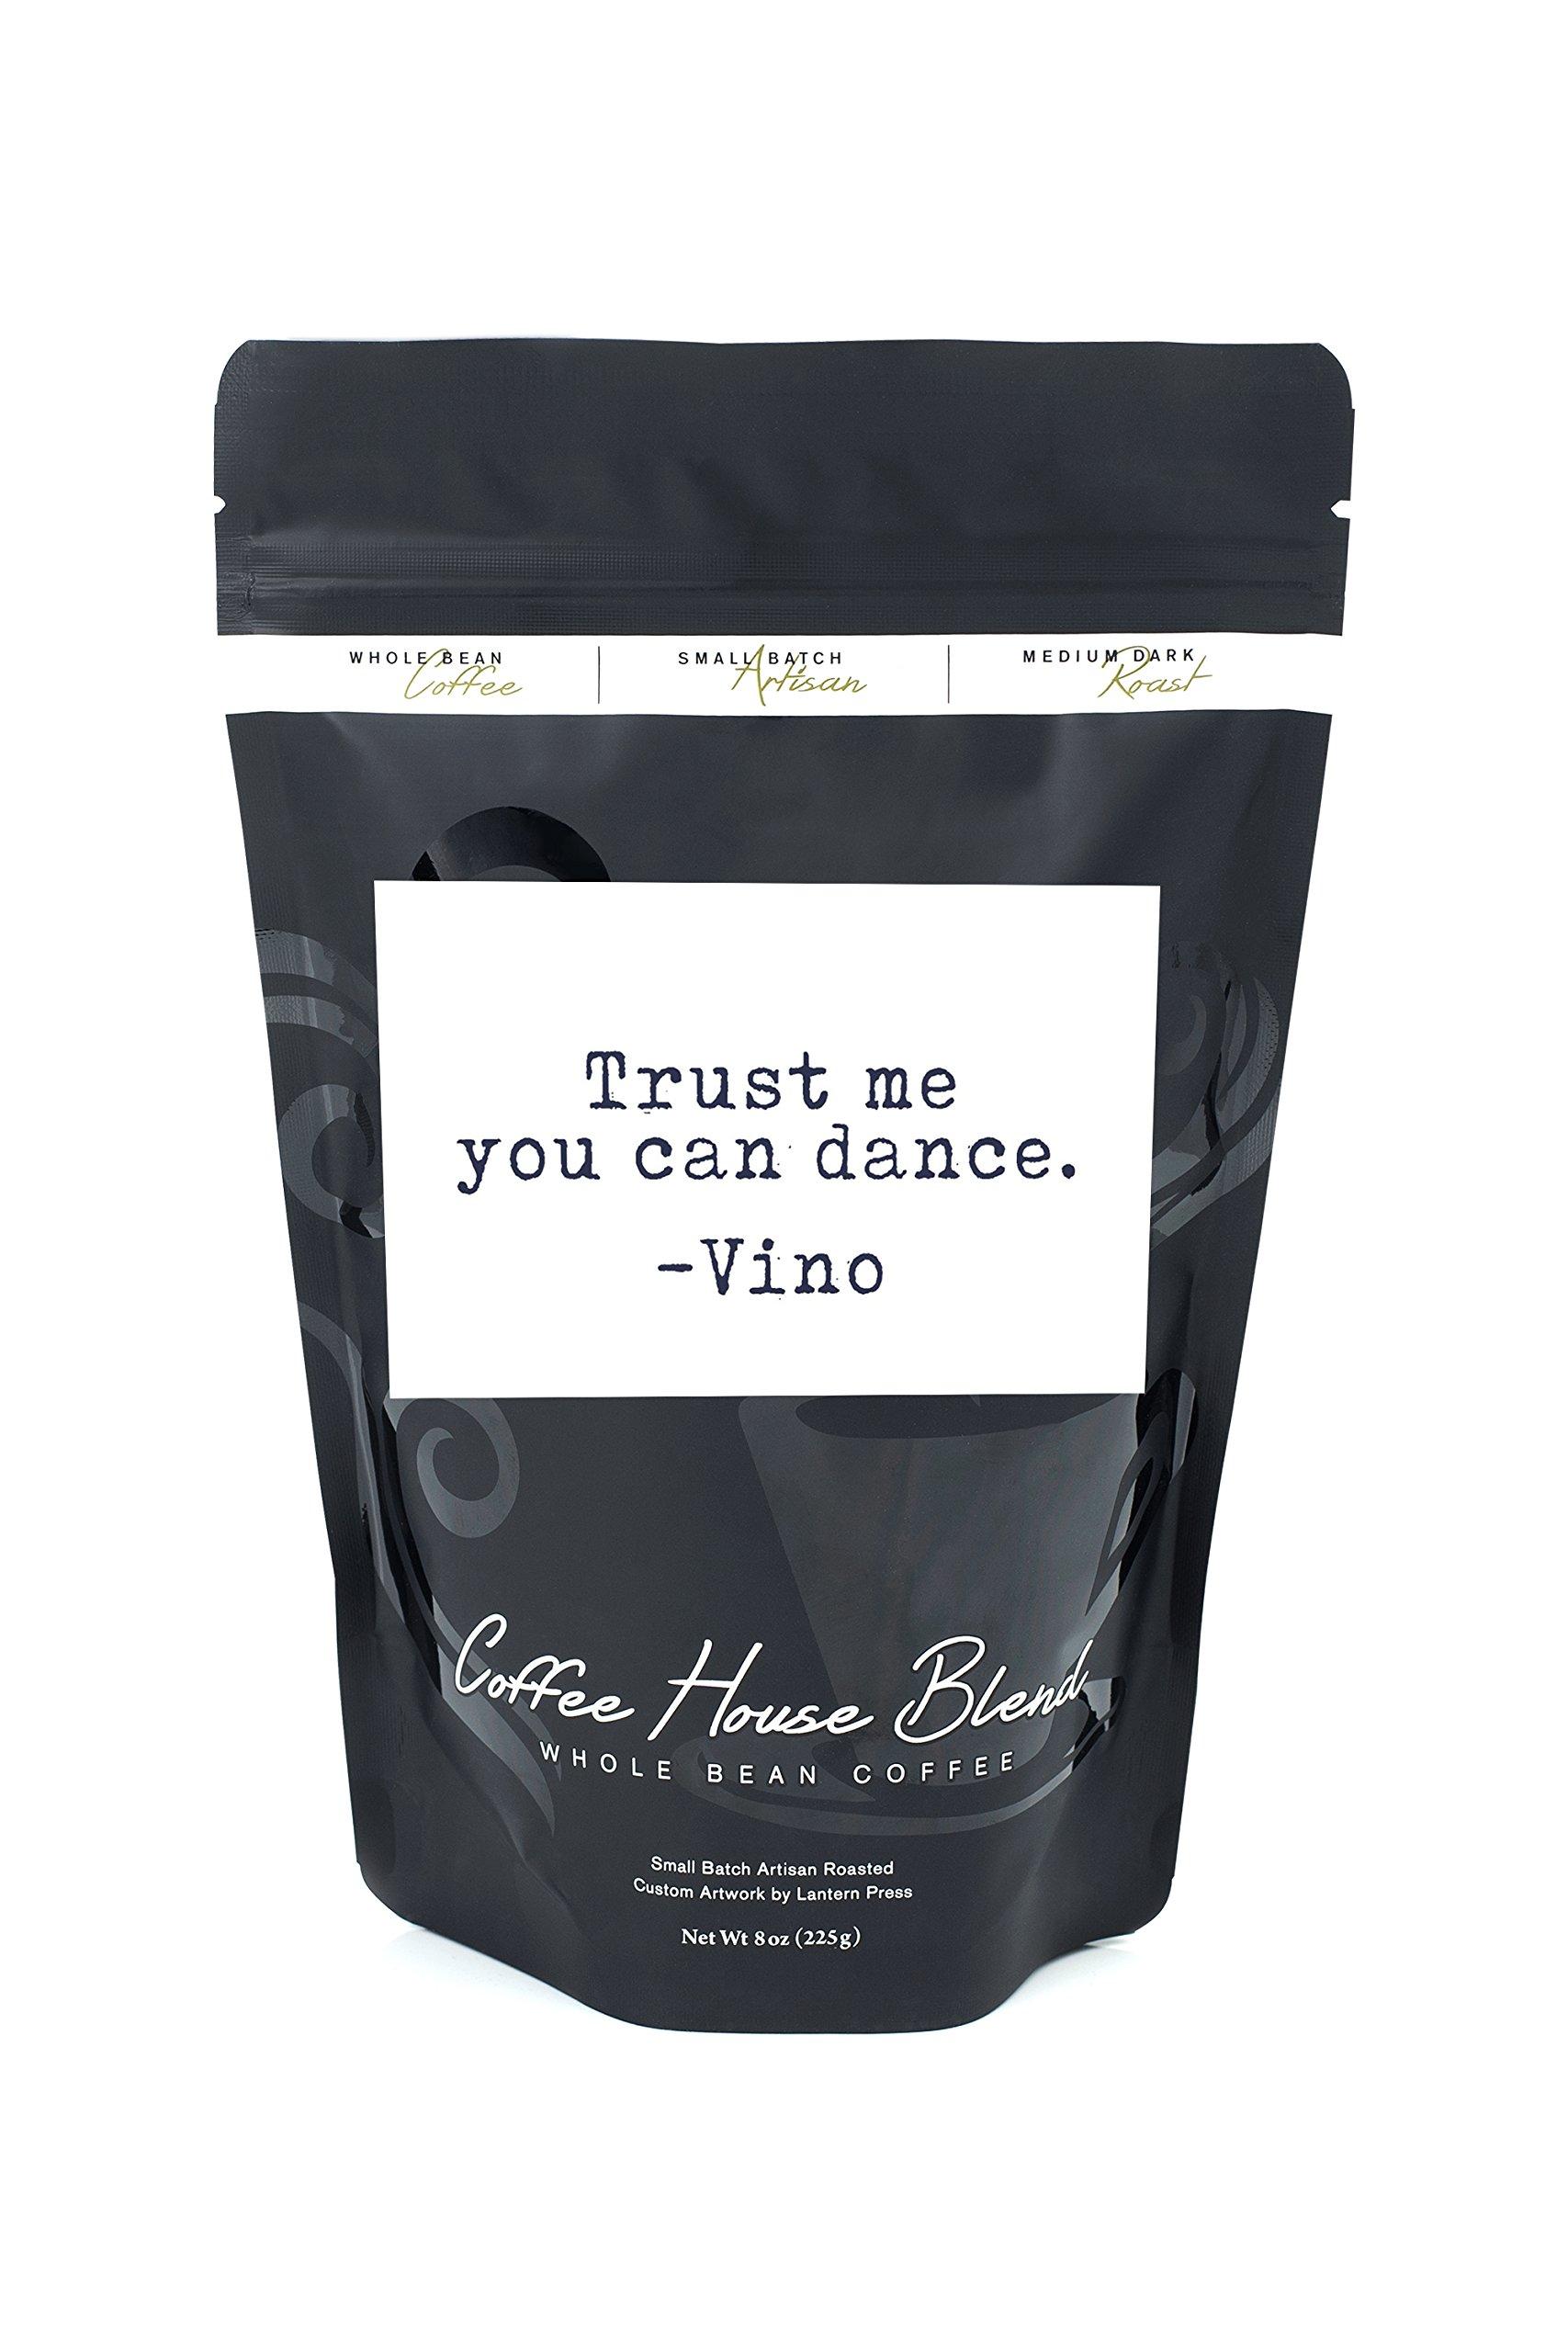 Trust me you can dance - Wine Sayings - Typewriter Text (8oz Whole Bean Small Batch Artisan Coffee - Bold & Strong Medium Dark Roast w/ Artwork)